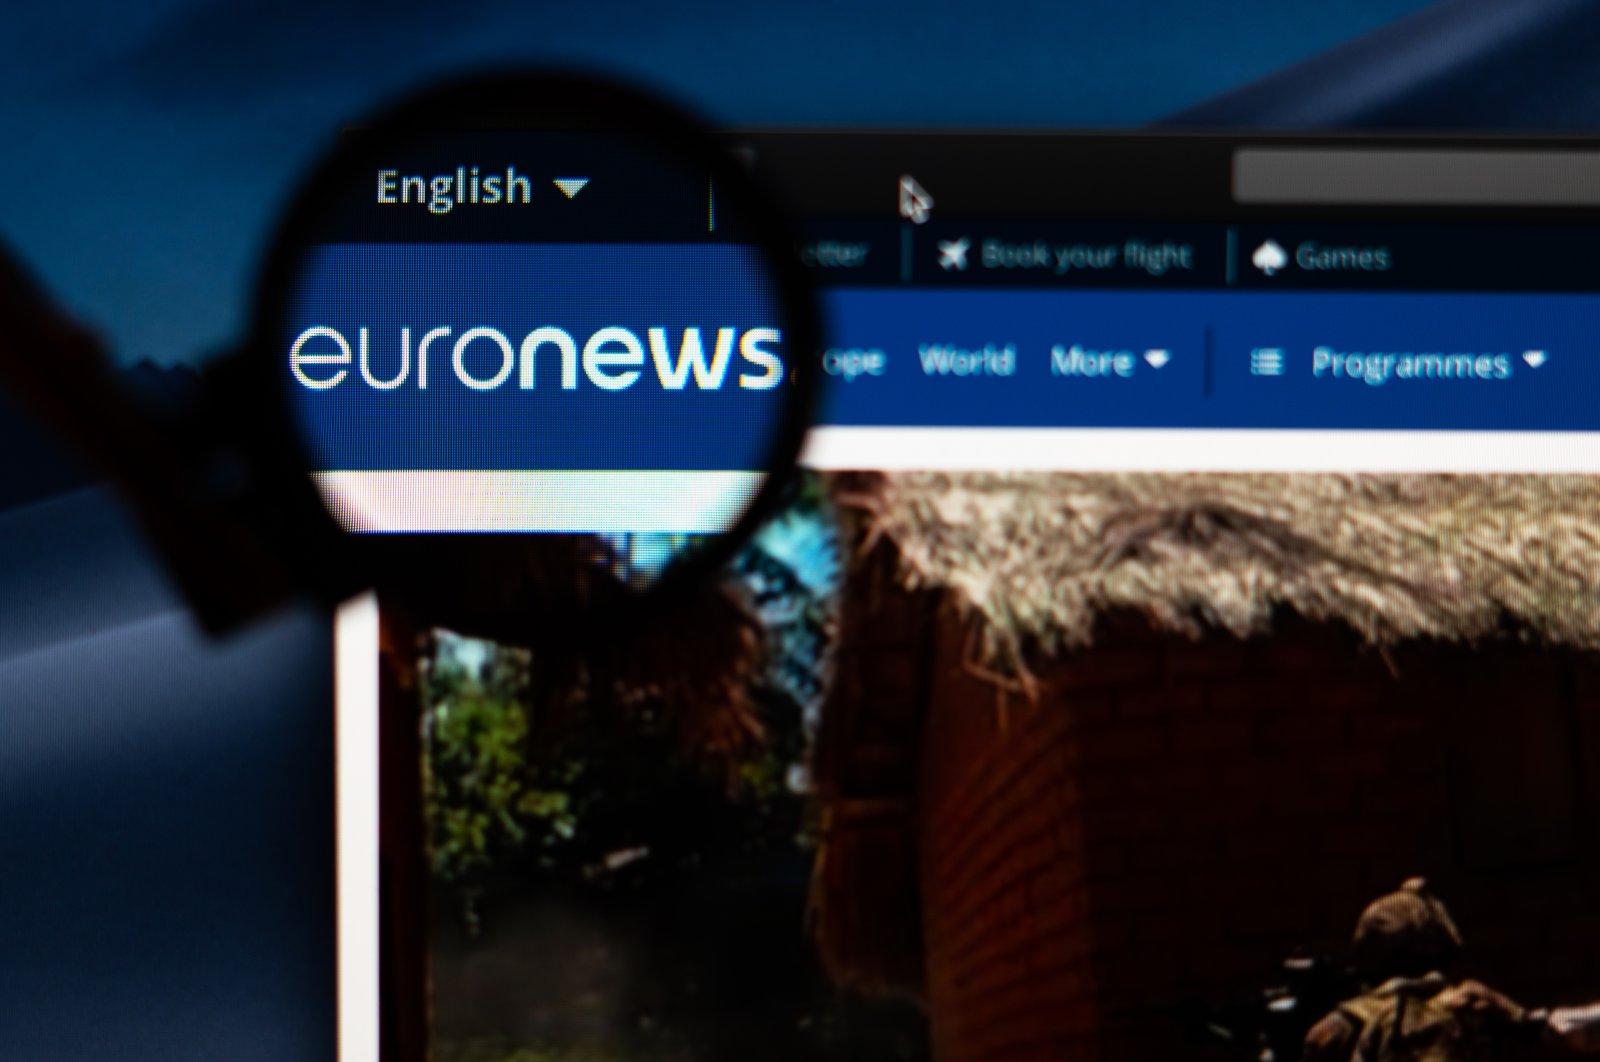 The Euronews logo on its website's homepage, Tallinn, Estonia, Jan. 18, 2019. (Shutterstock Photo)